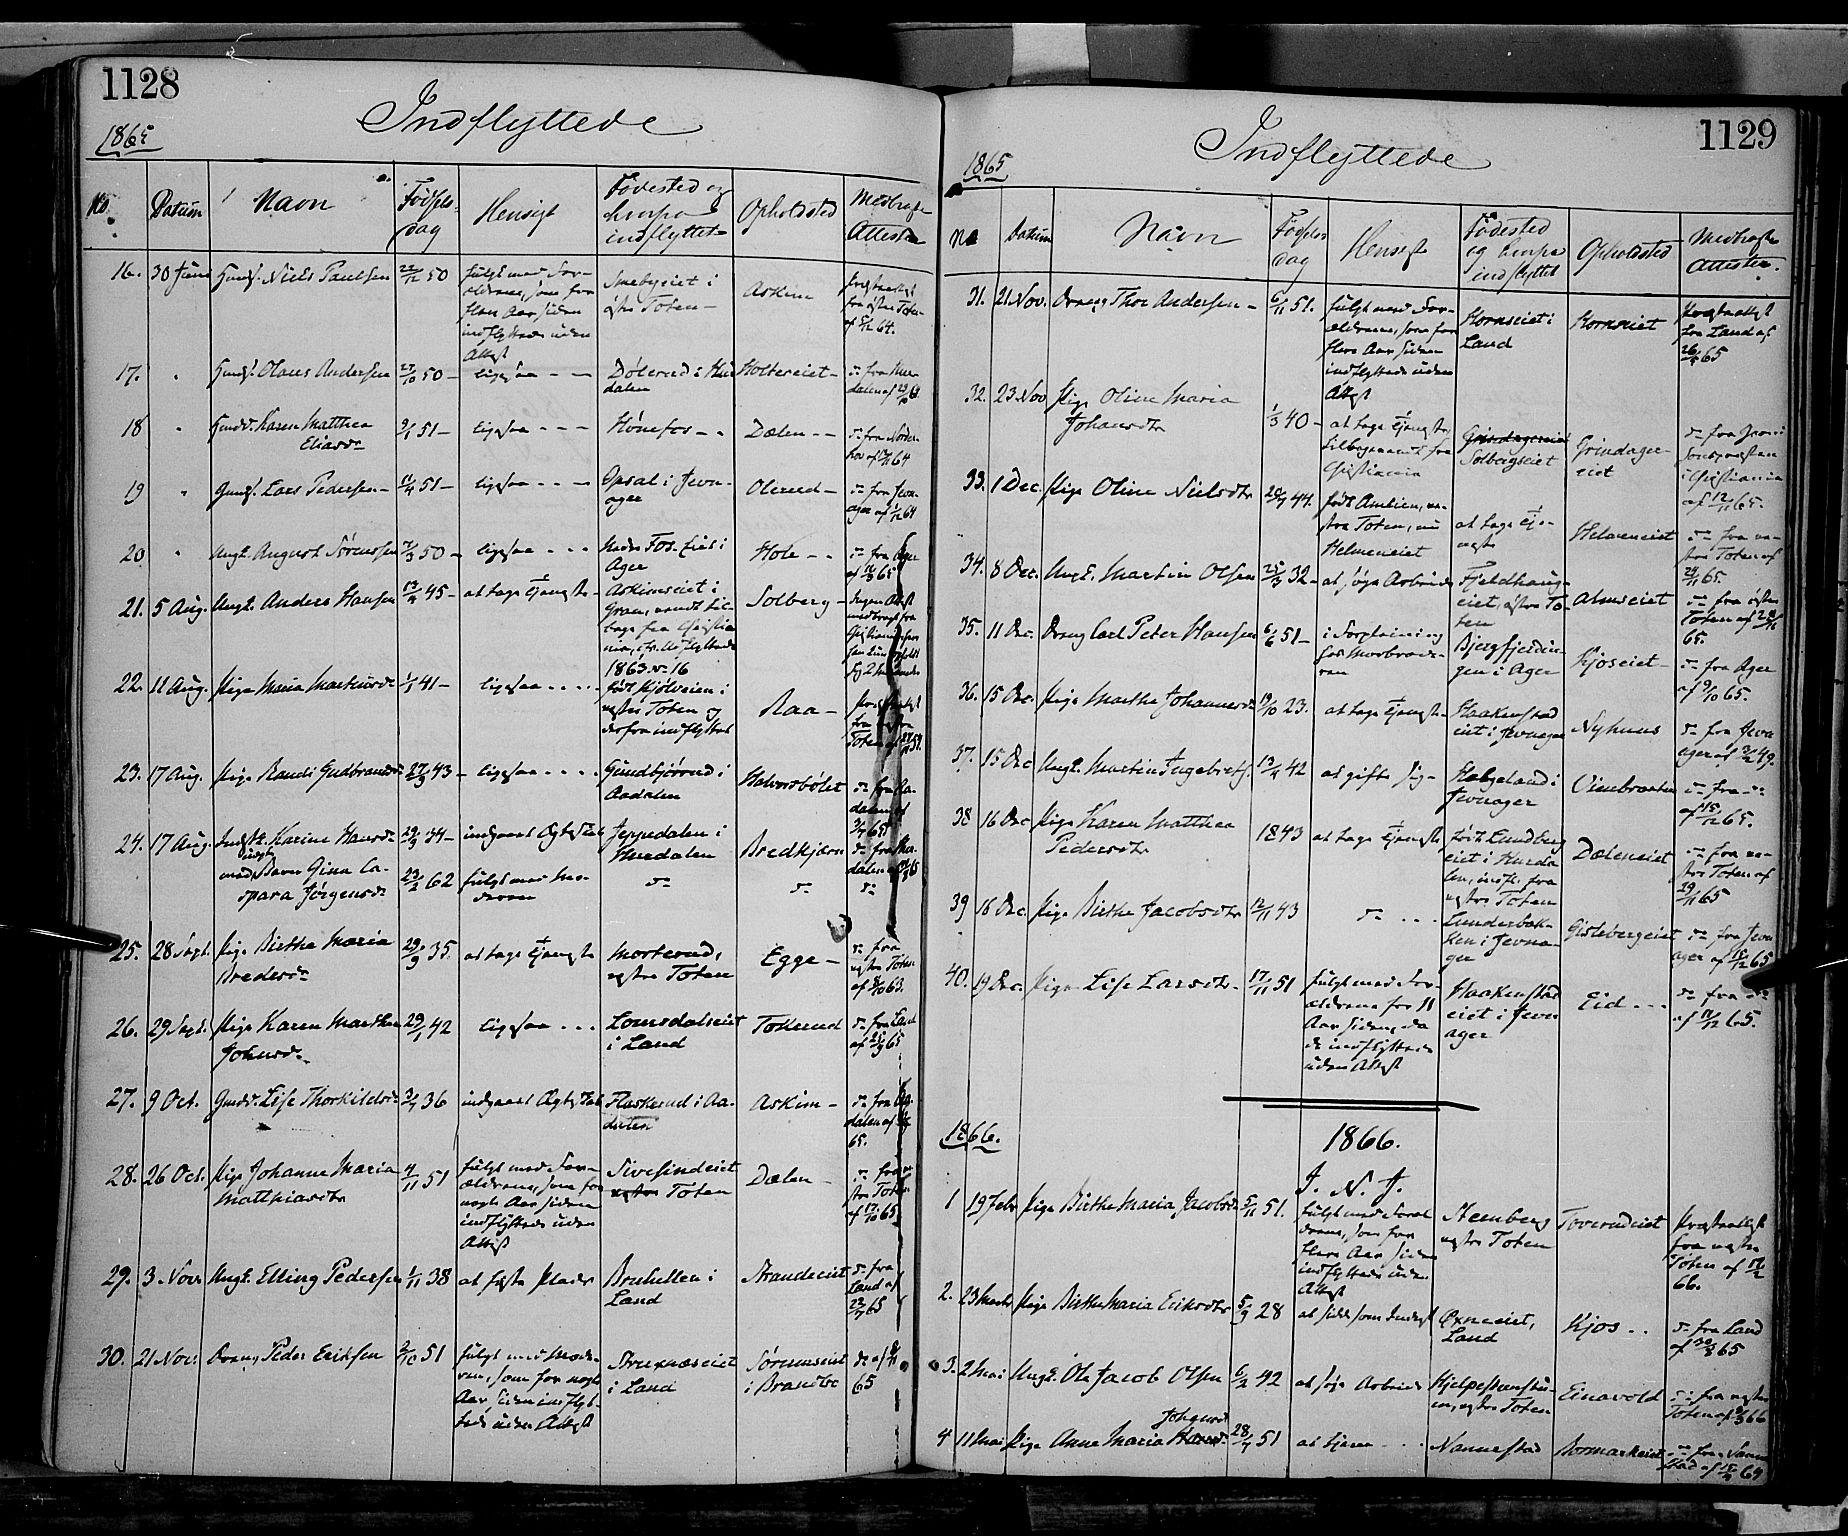 SAH, Gran prestekontor, Ministerialbok nr. 12, 1856-1874, s. 1128-1129